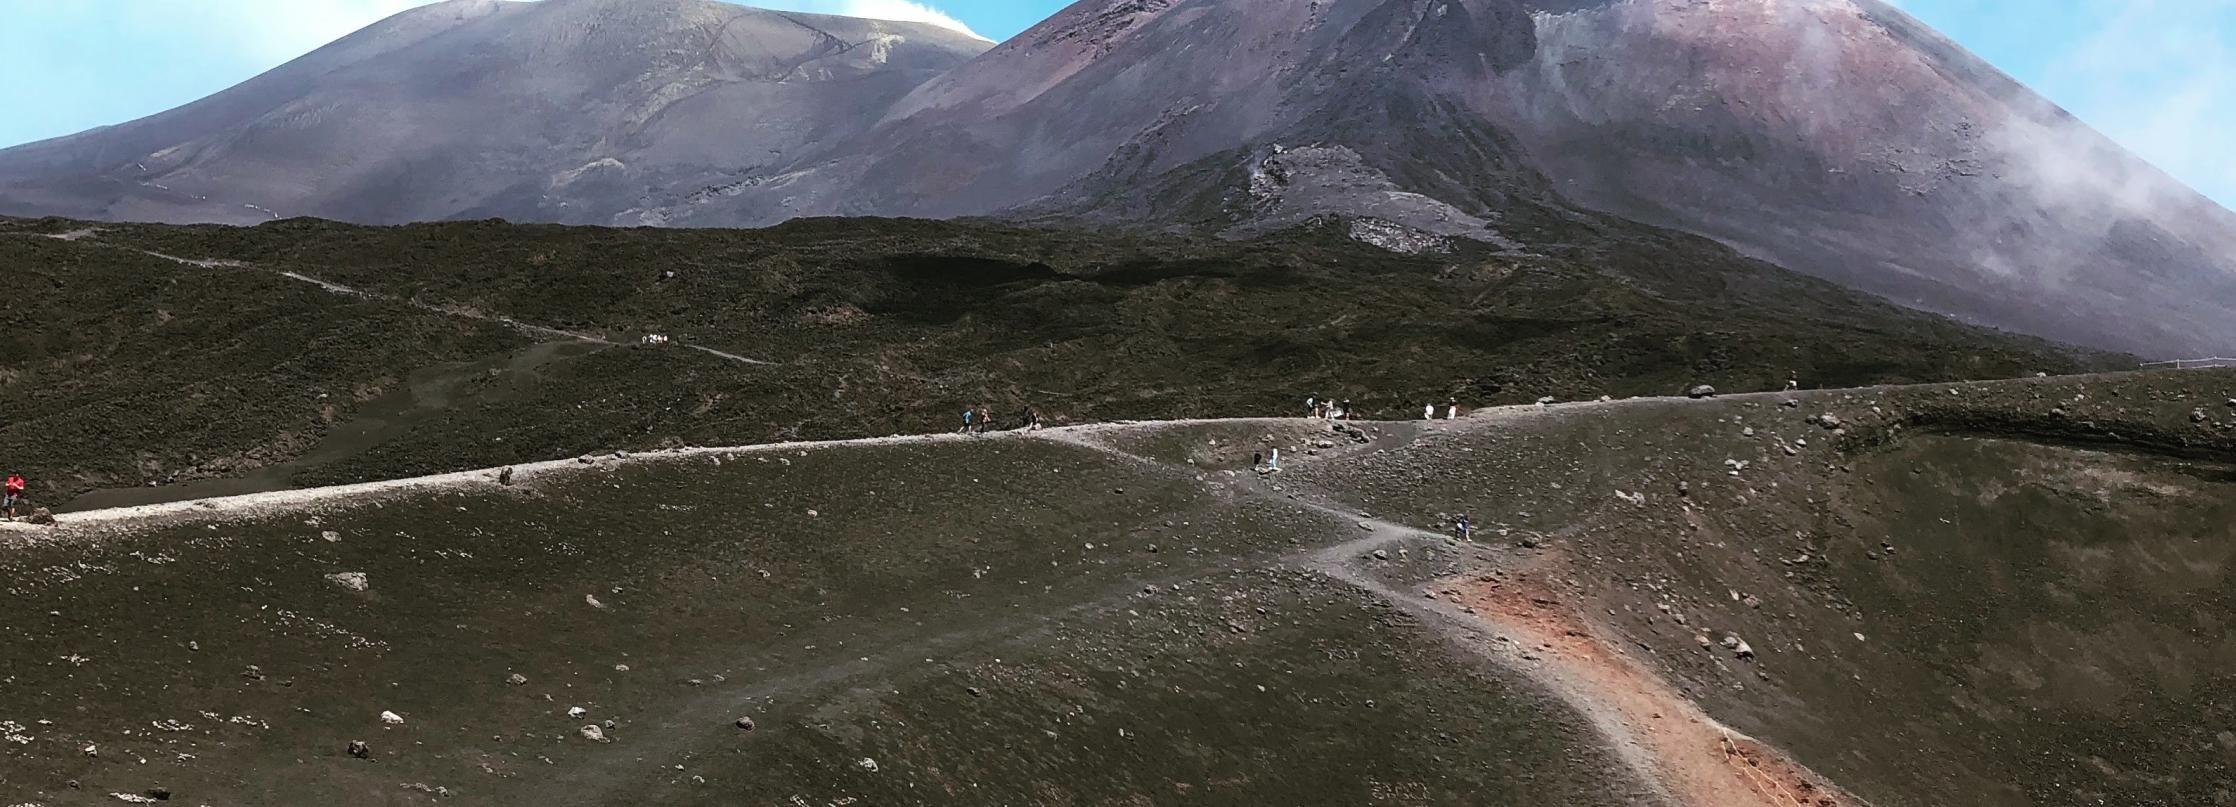 Desde Taormina: Área de la Cumbre del Etna (2900 m), Almuerzo y Alcántara